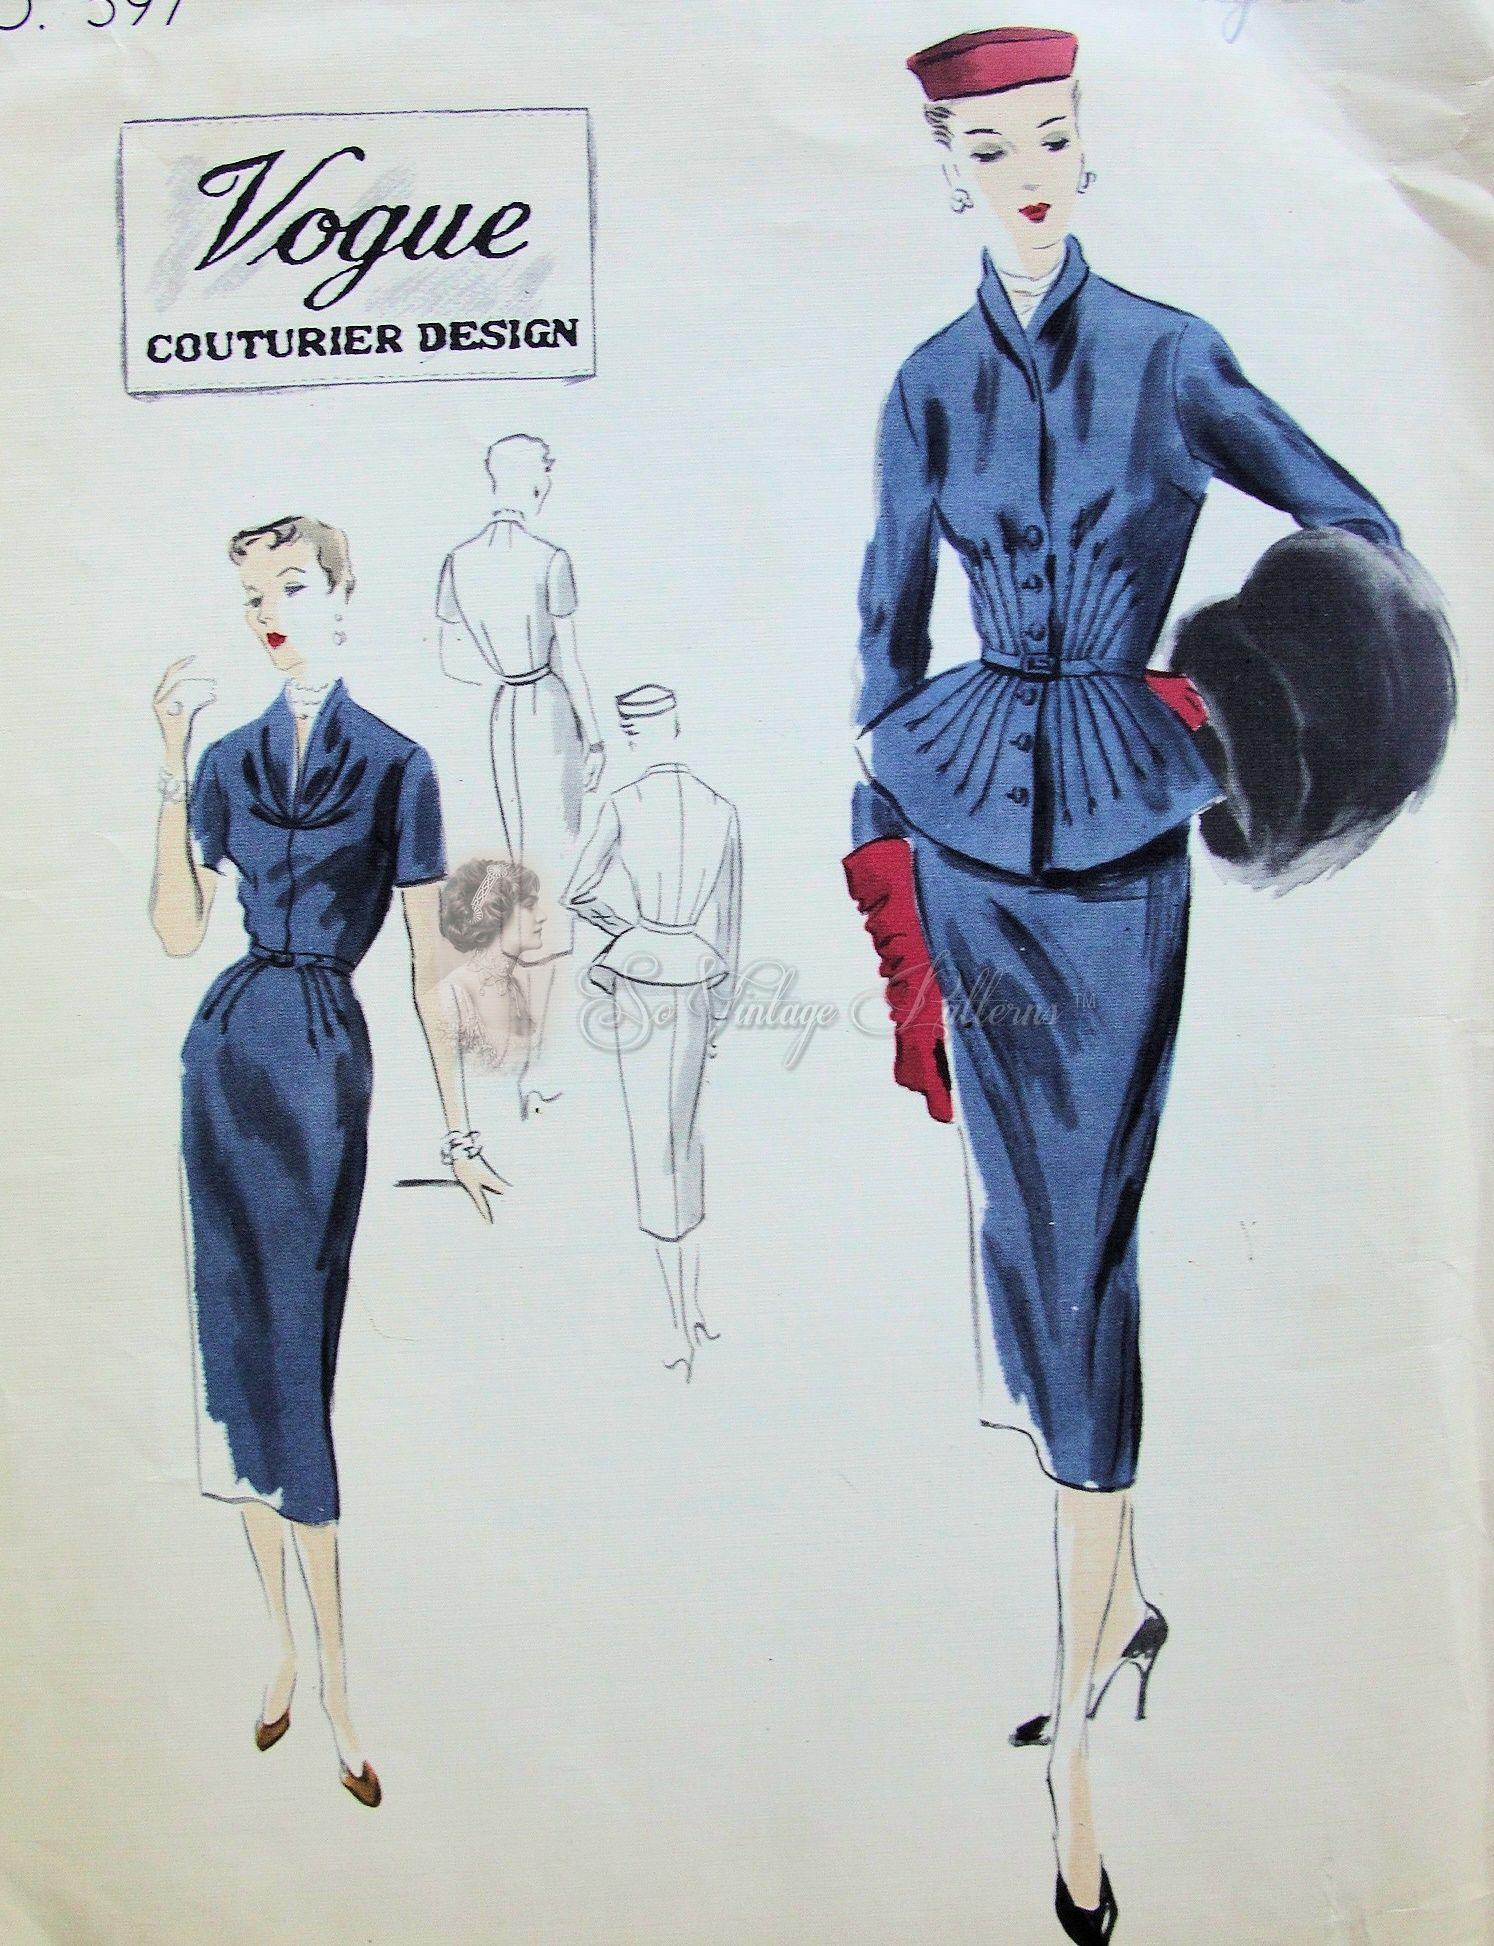 Vogue 597